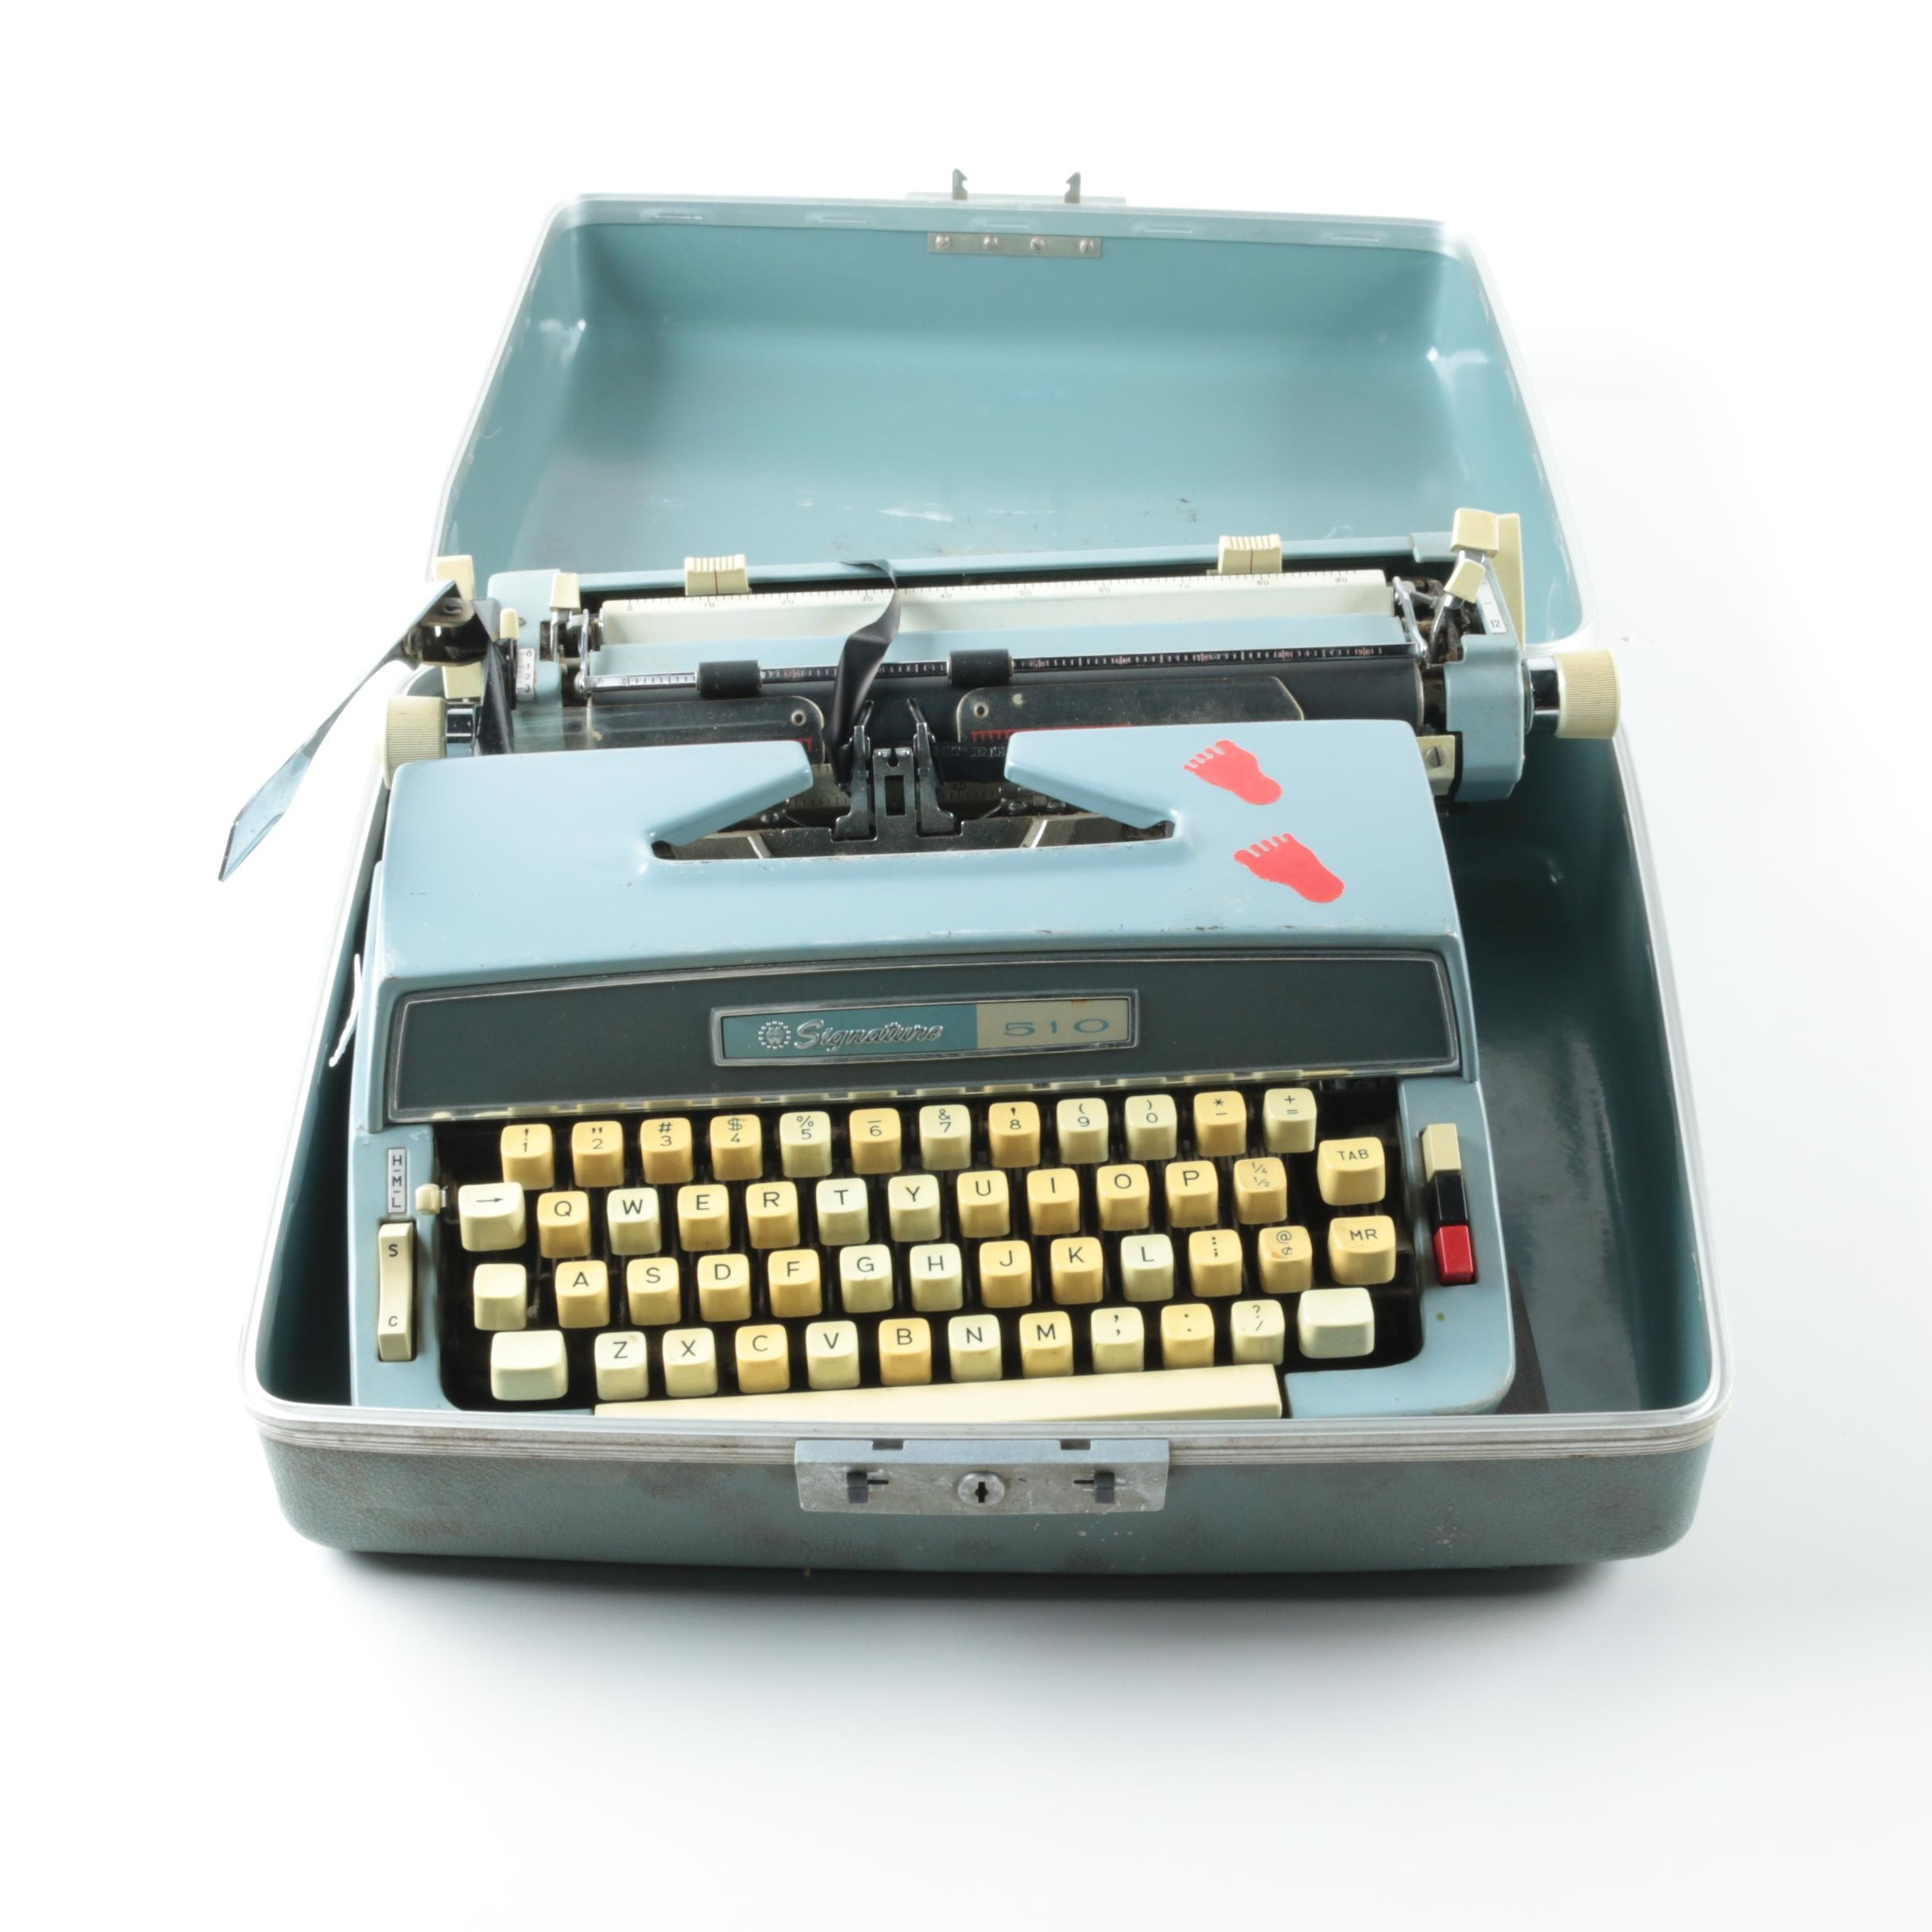 Signature 510 Typewriter